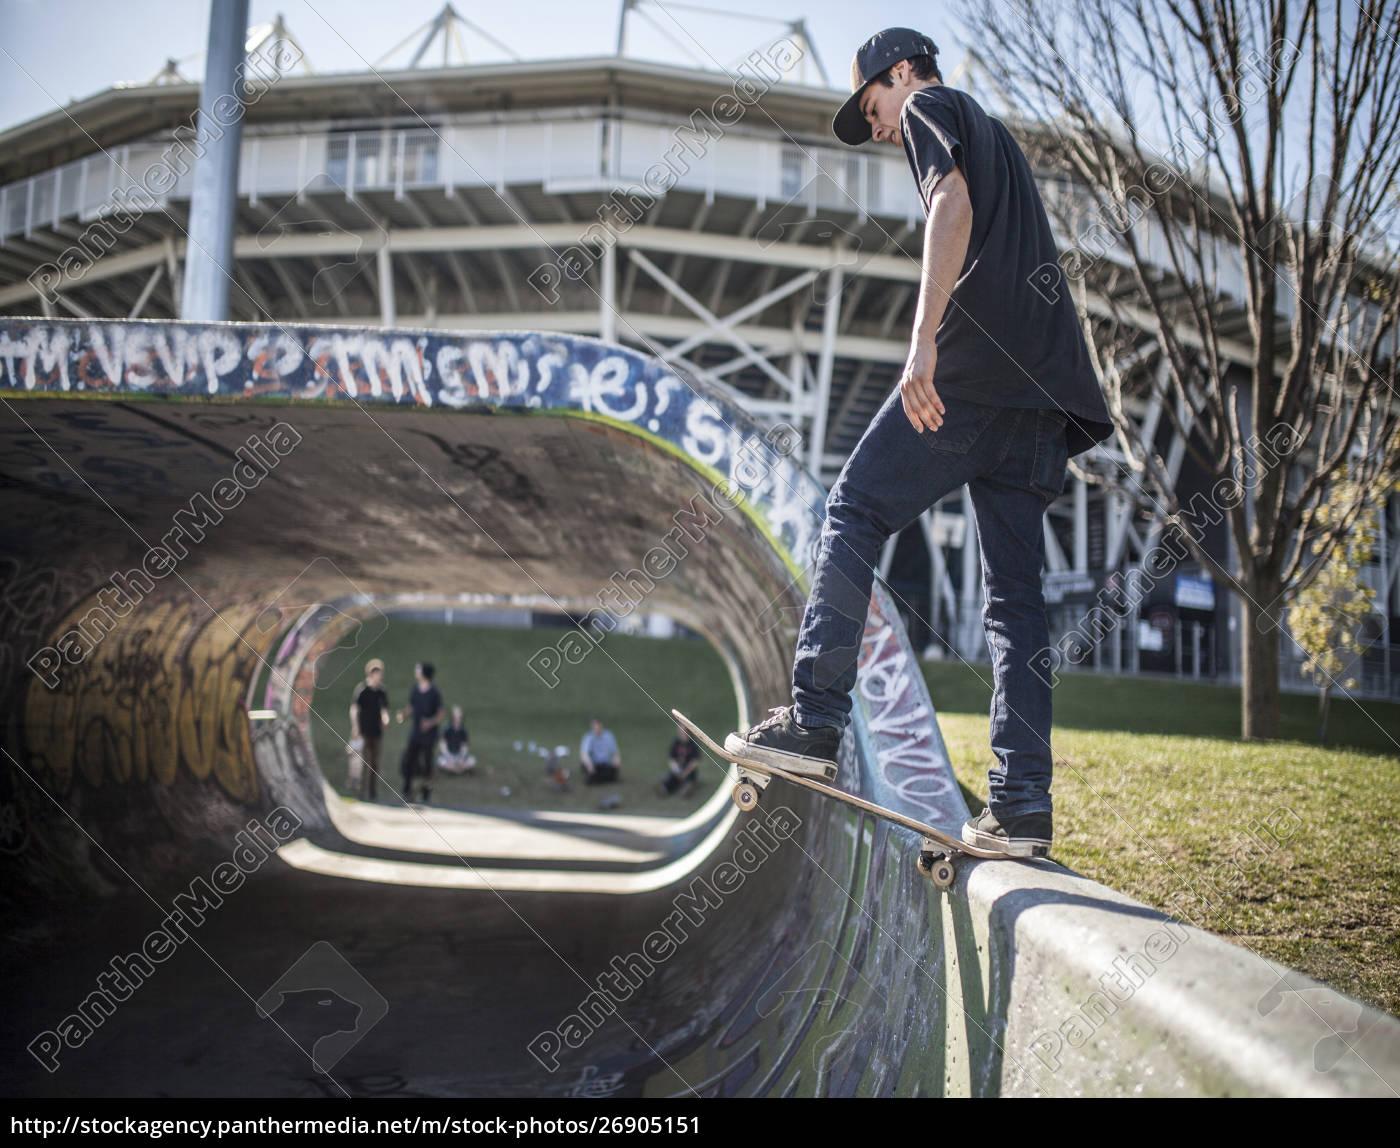 caucasian, man, skating, on, half, pipe - 26905151